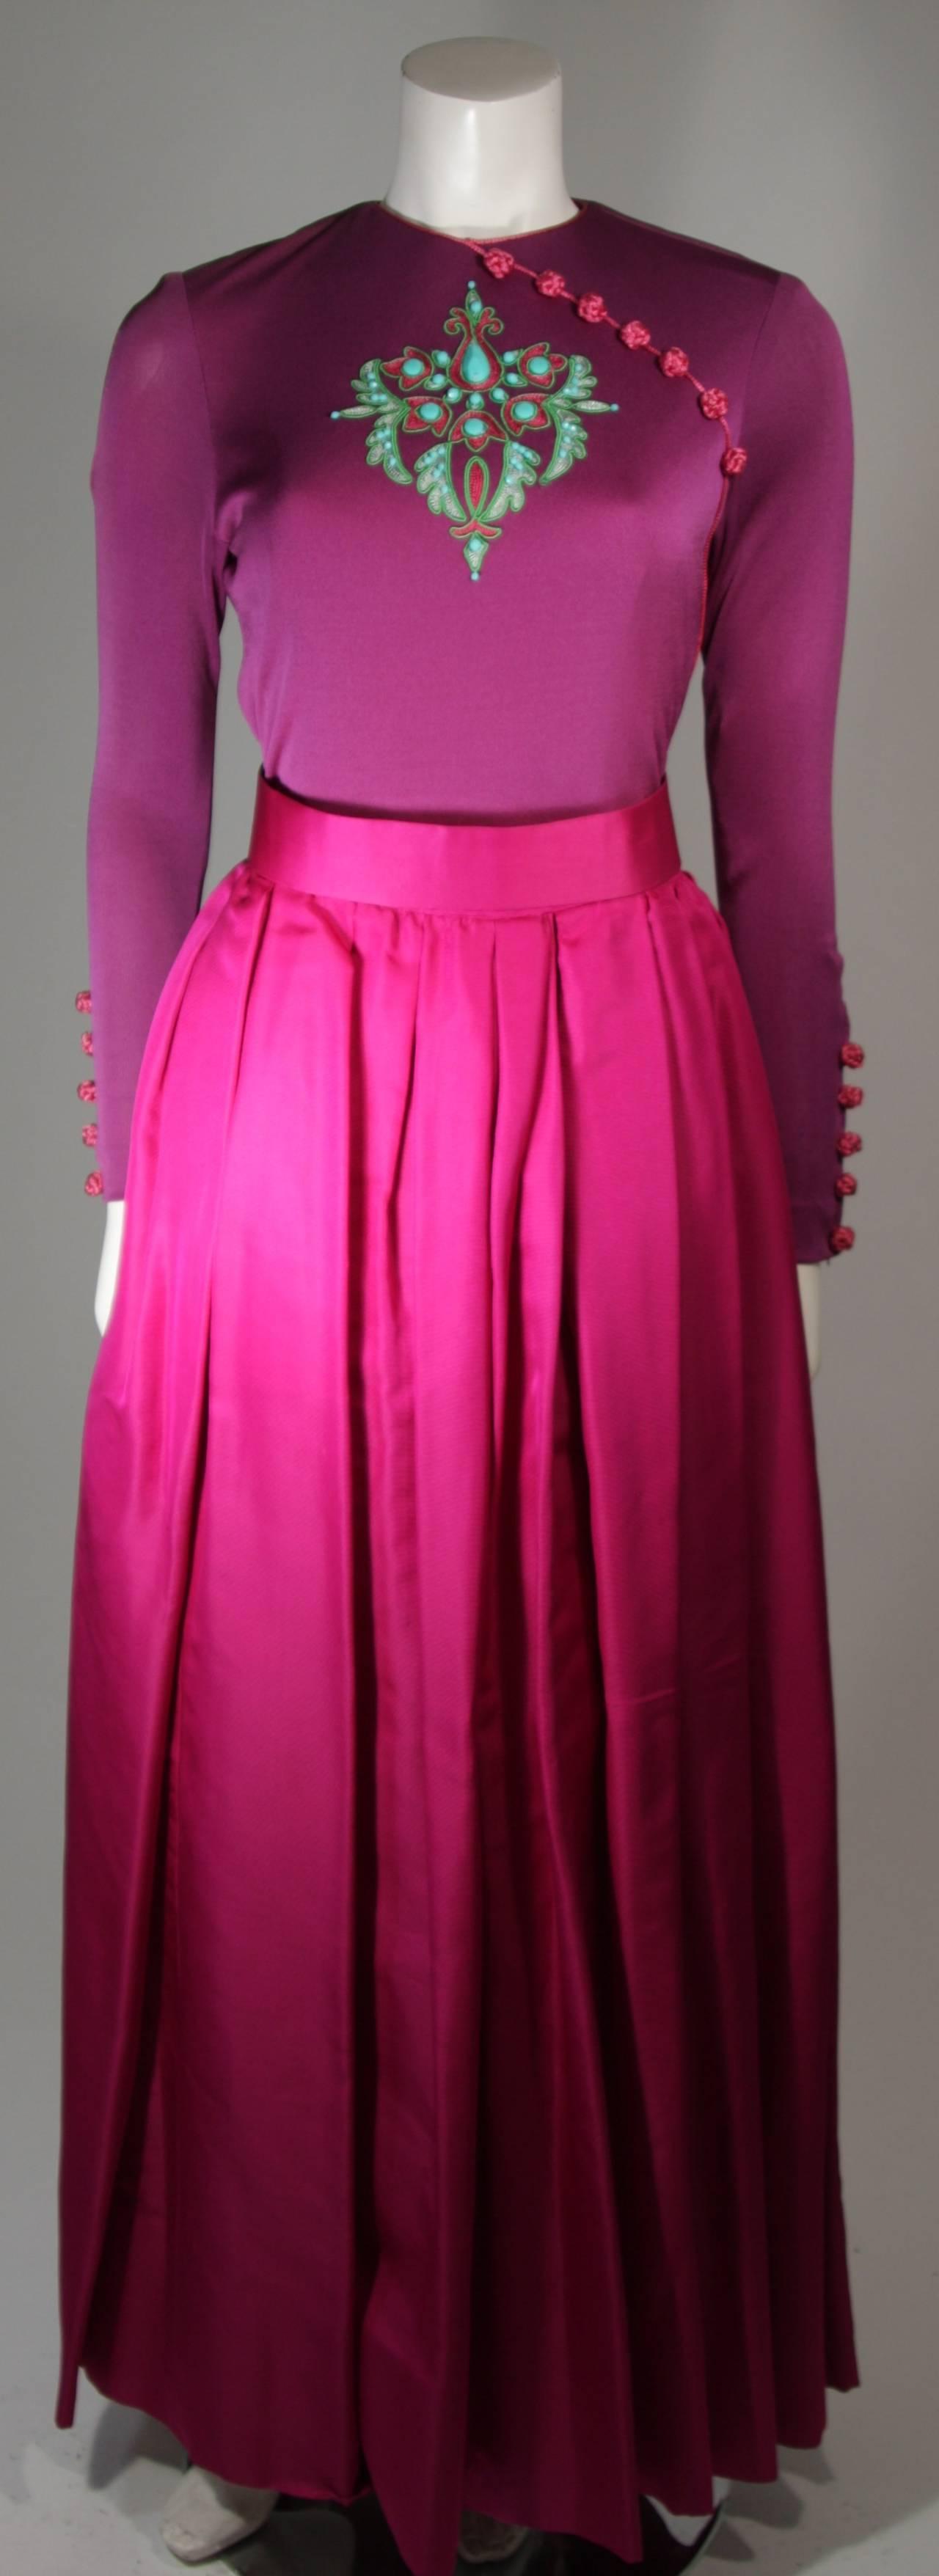 Bob Mackie Evening Skirt Set Ensemble in Purple Size Small 2